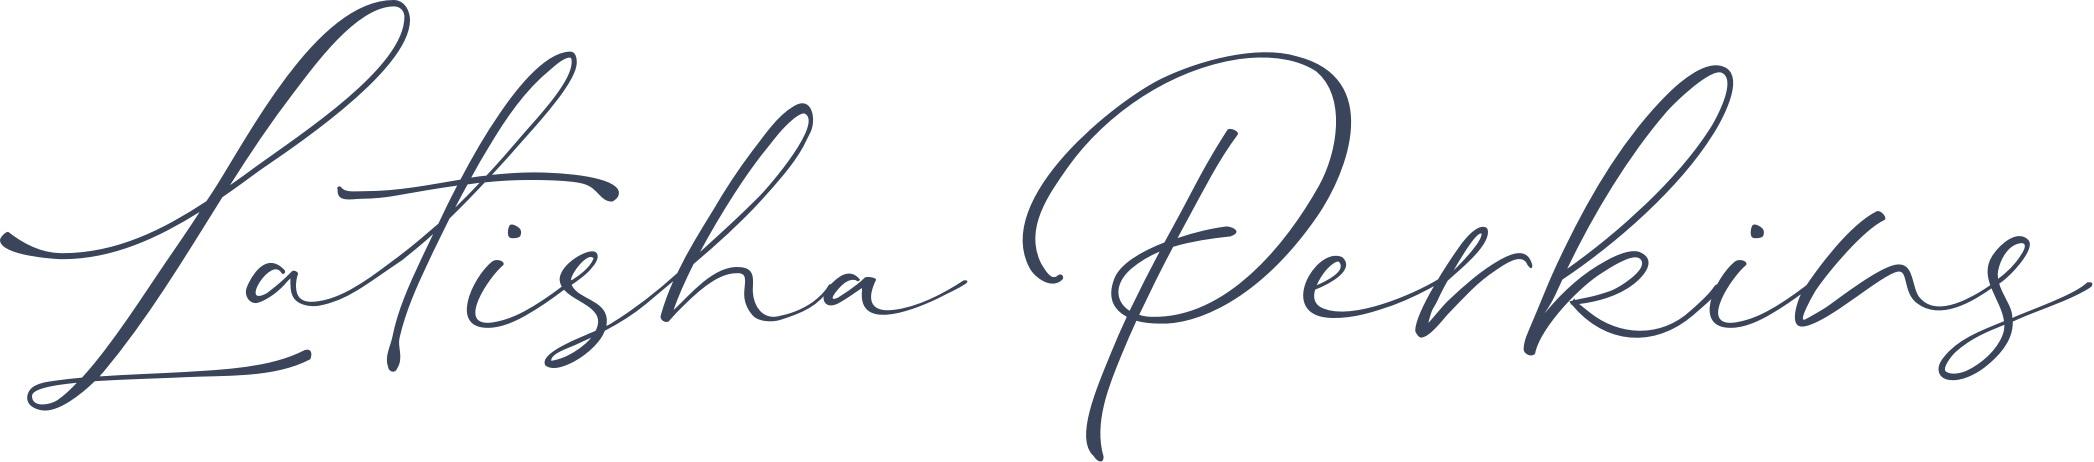 Edify-Signature-LatishaPerkins.jpg